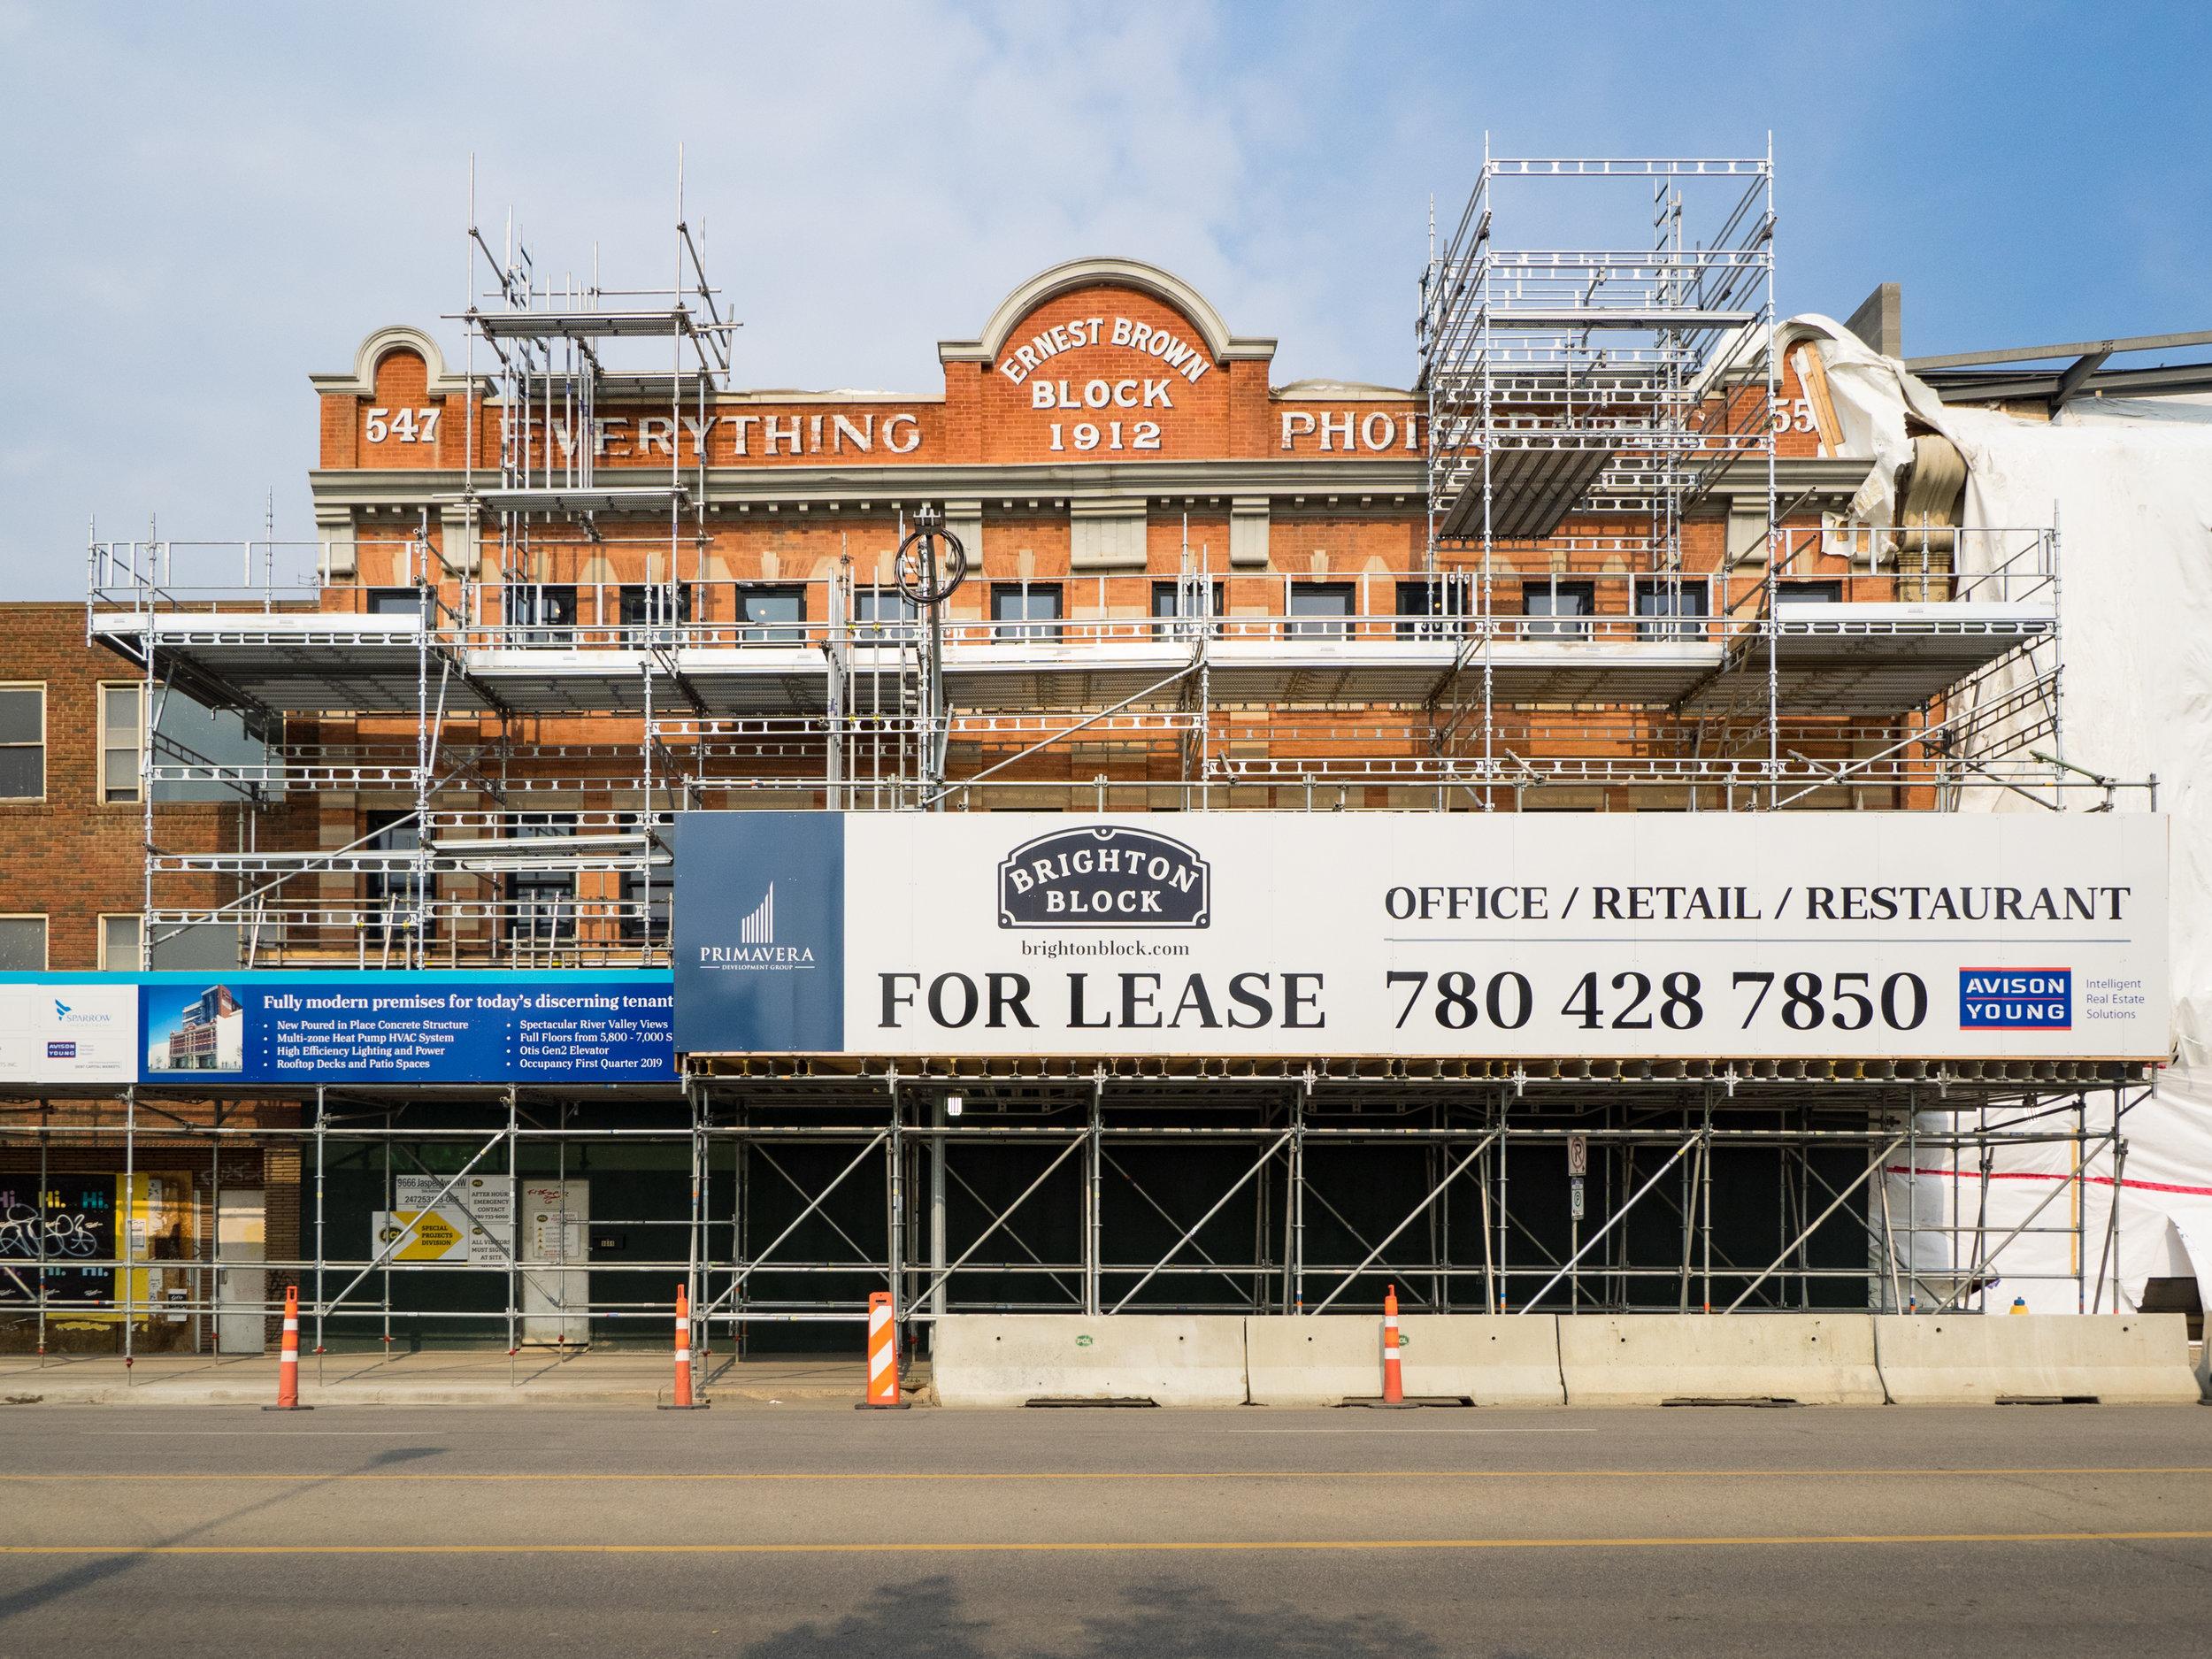 Brighton Block on Jasper Avenue, photo by Dave Sutherland